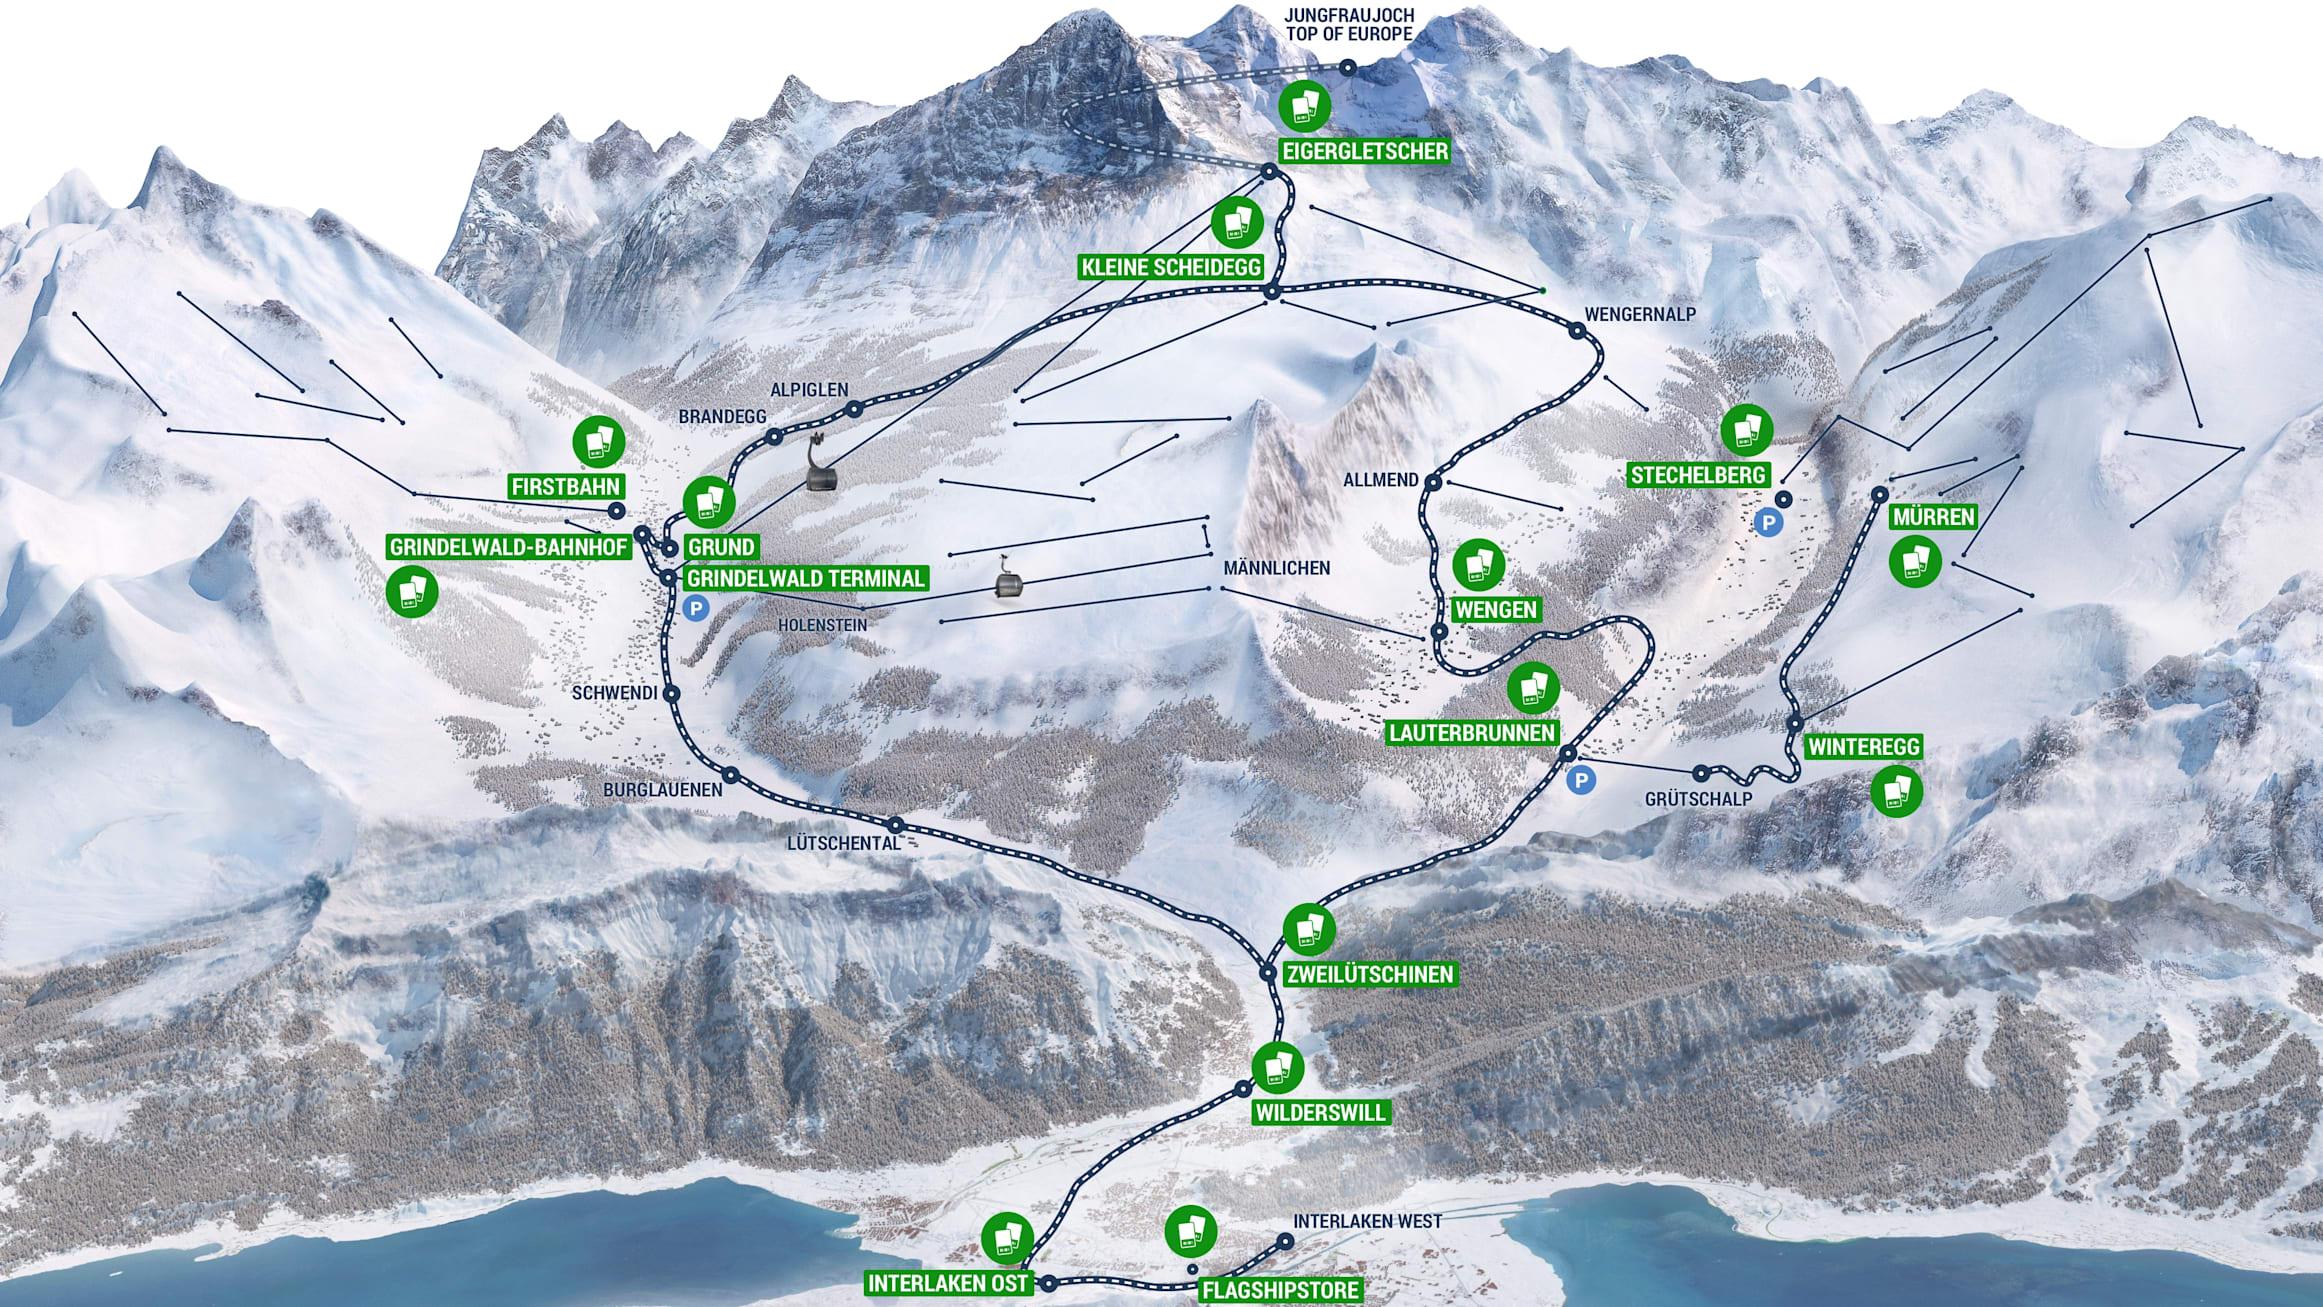 Jungfrau Ski Region Pick Up Skipass